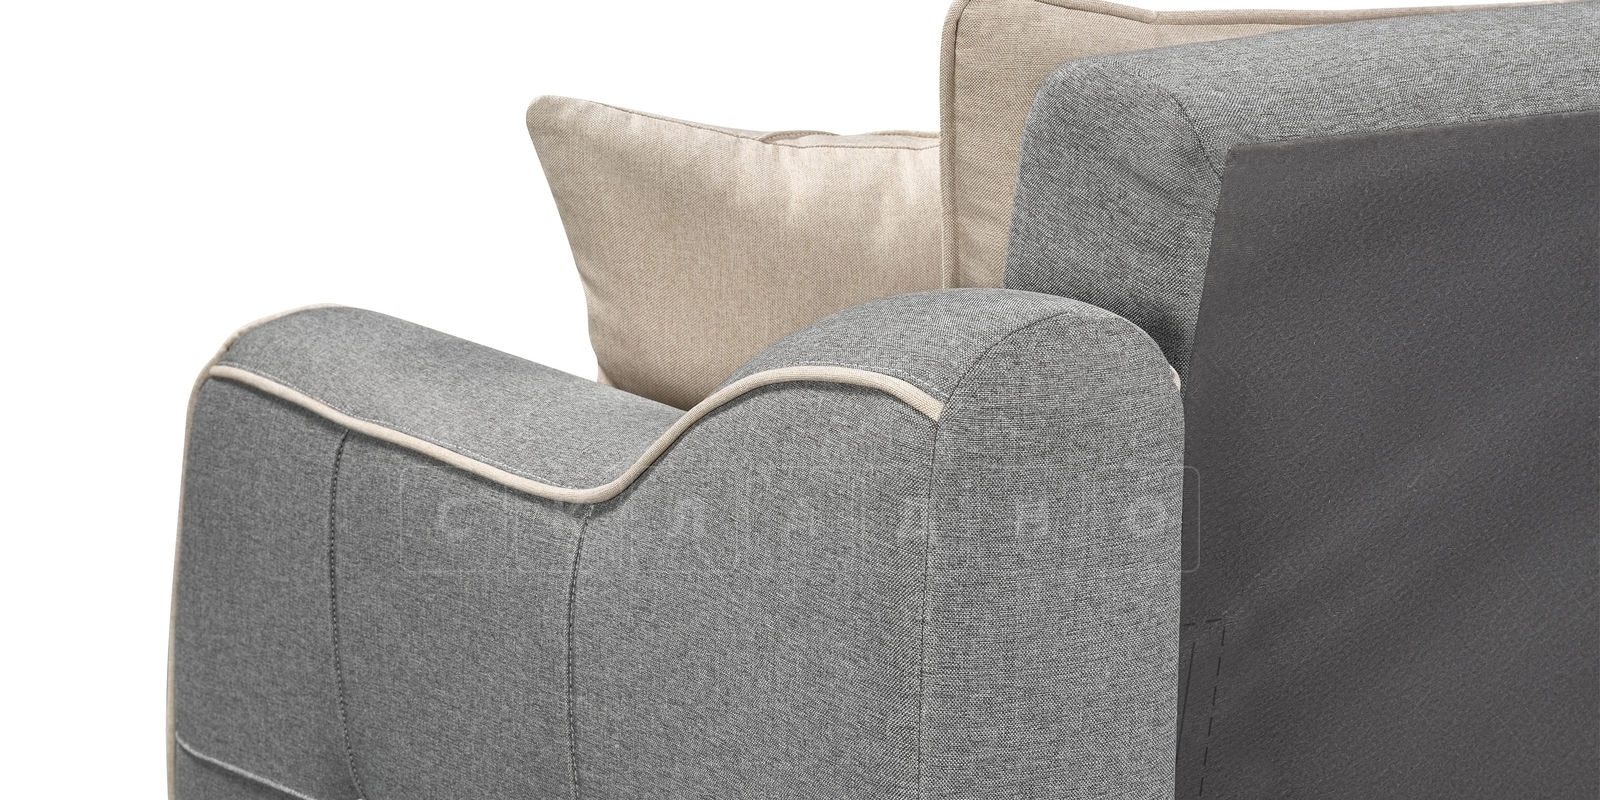 Диван Флэтфорд рогожка серый цвет фото 4 | интернет-магазин Складно